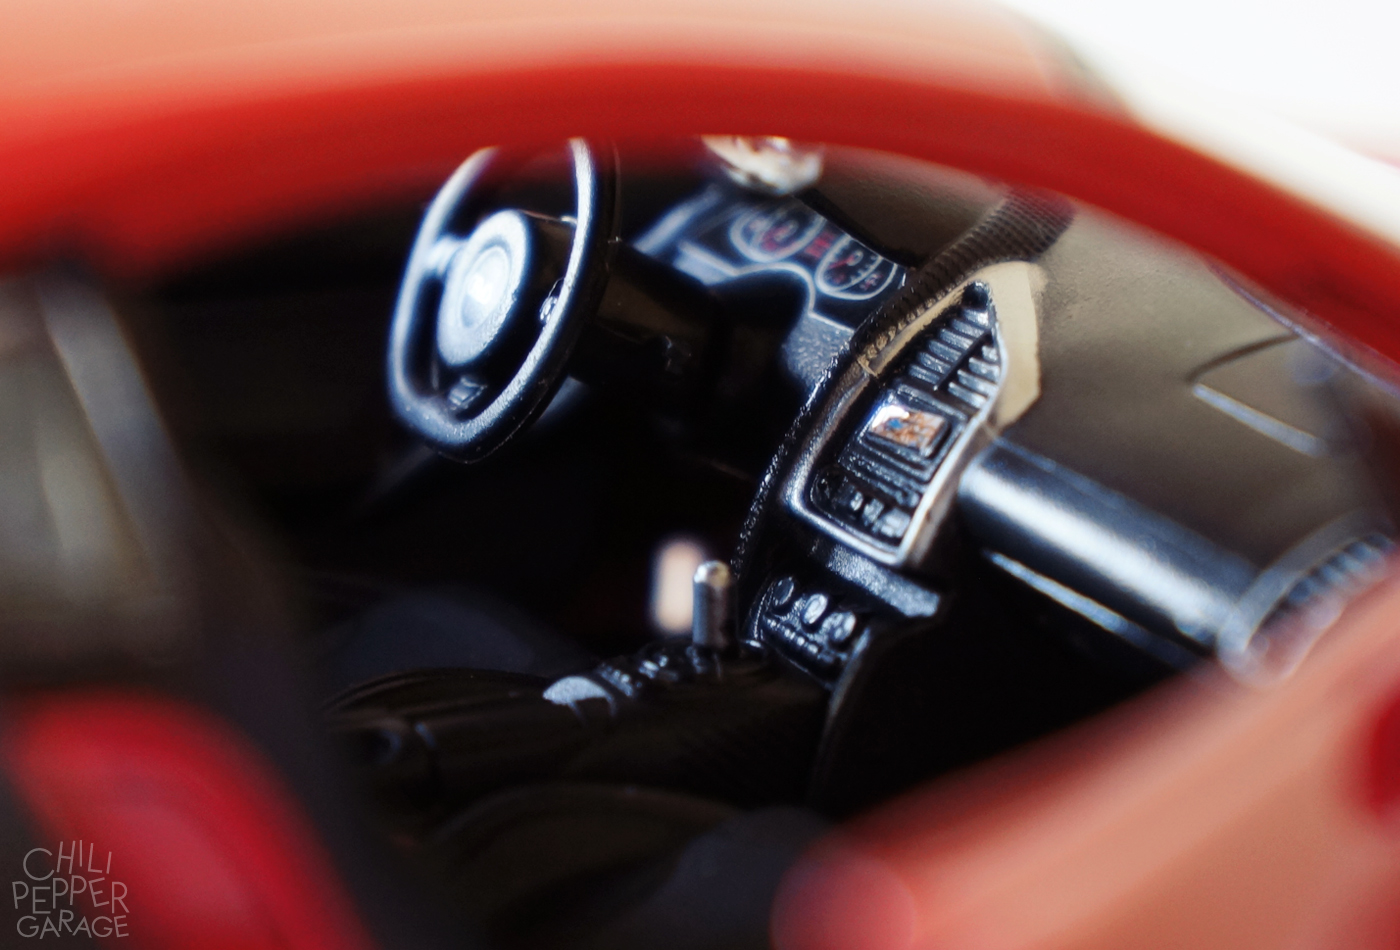 Audi chili pepper garage for Garage cda chilly